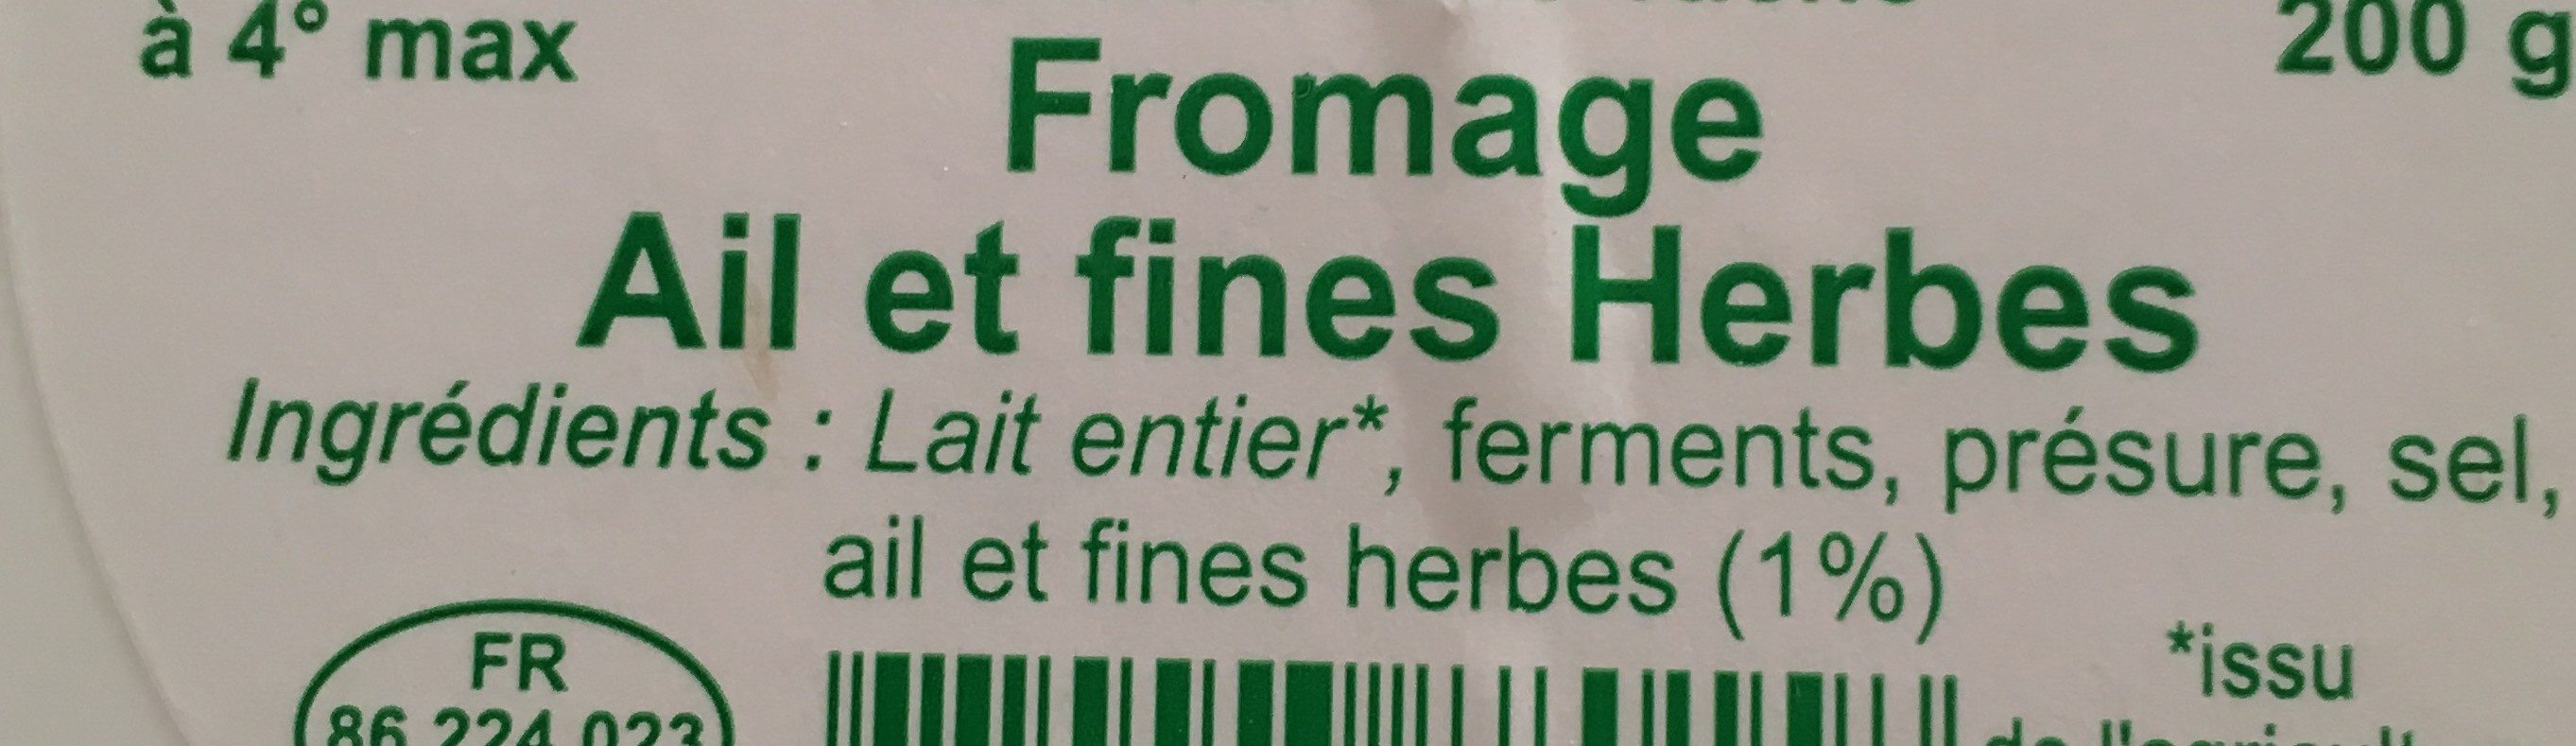 Fromage ail et fines herbes - Ingrediënten - fr